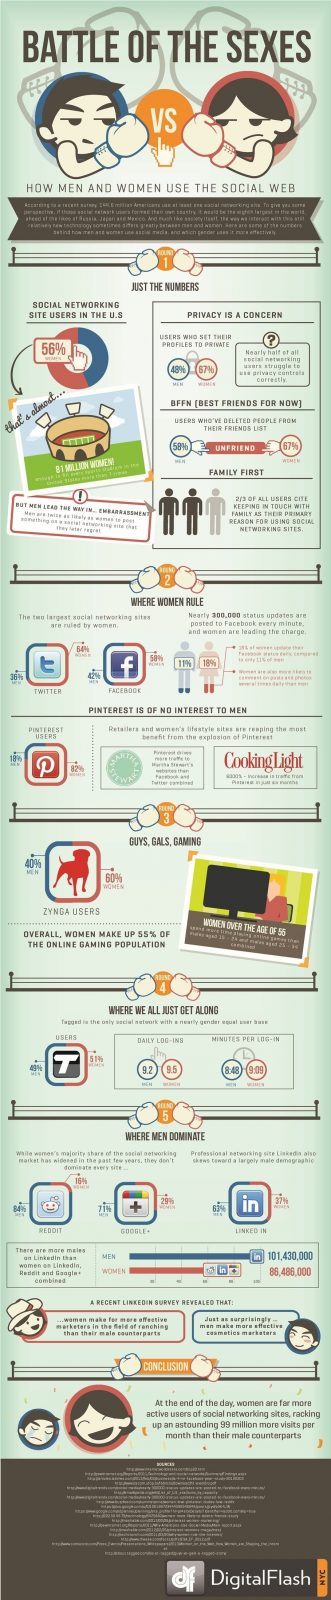 social network sono rosa